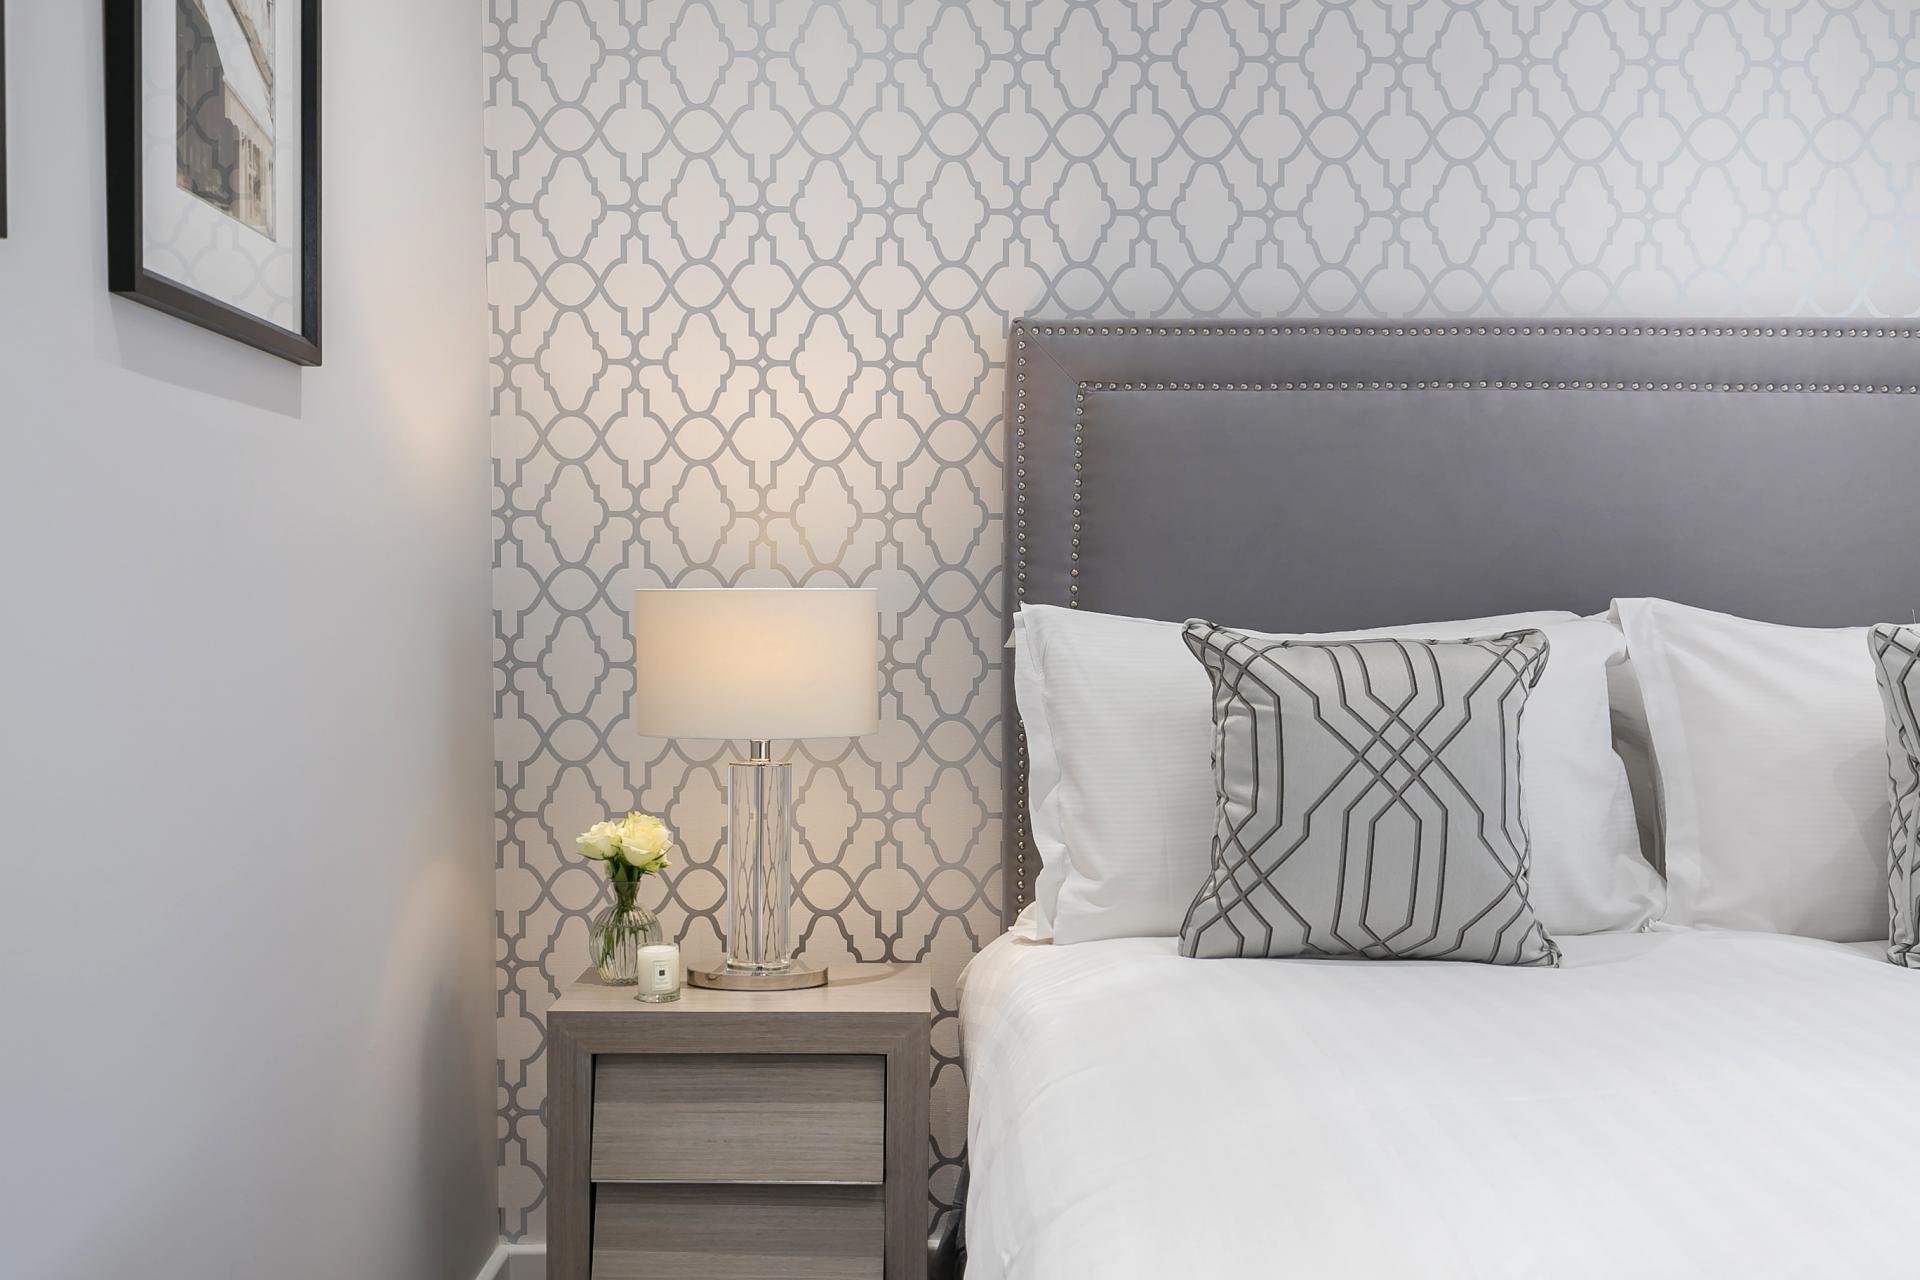 Bedroom at Chilworth Court Serviced Apartments, Paddington, London